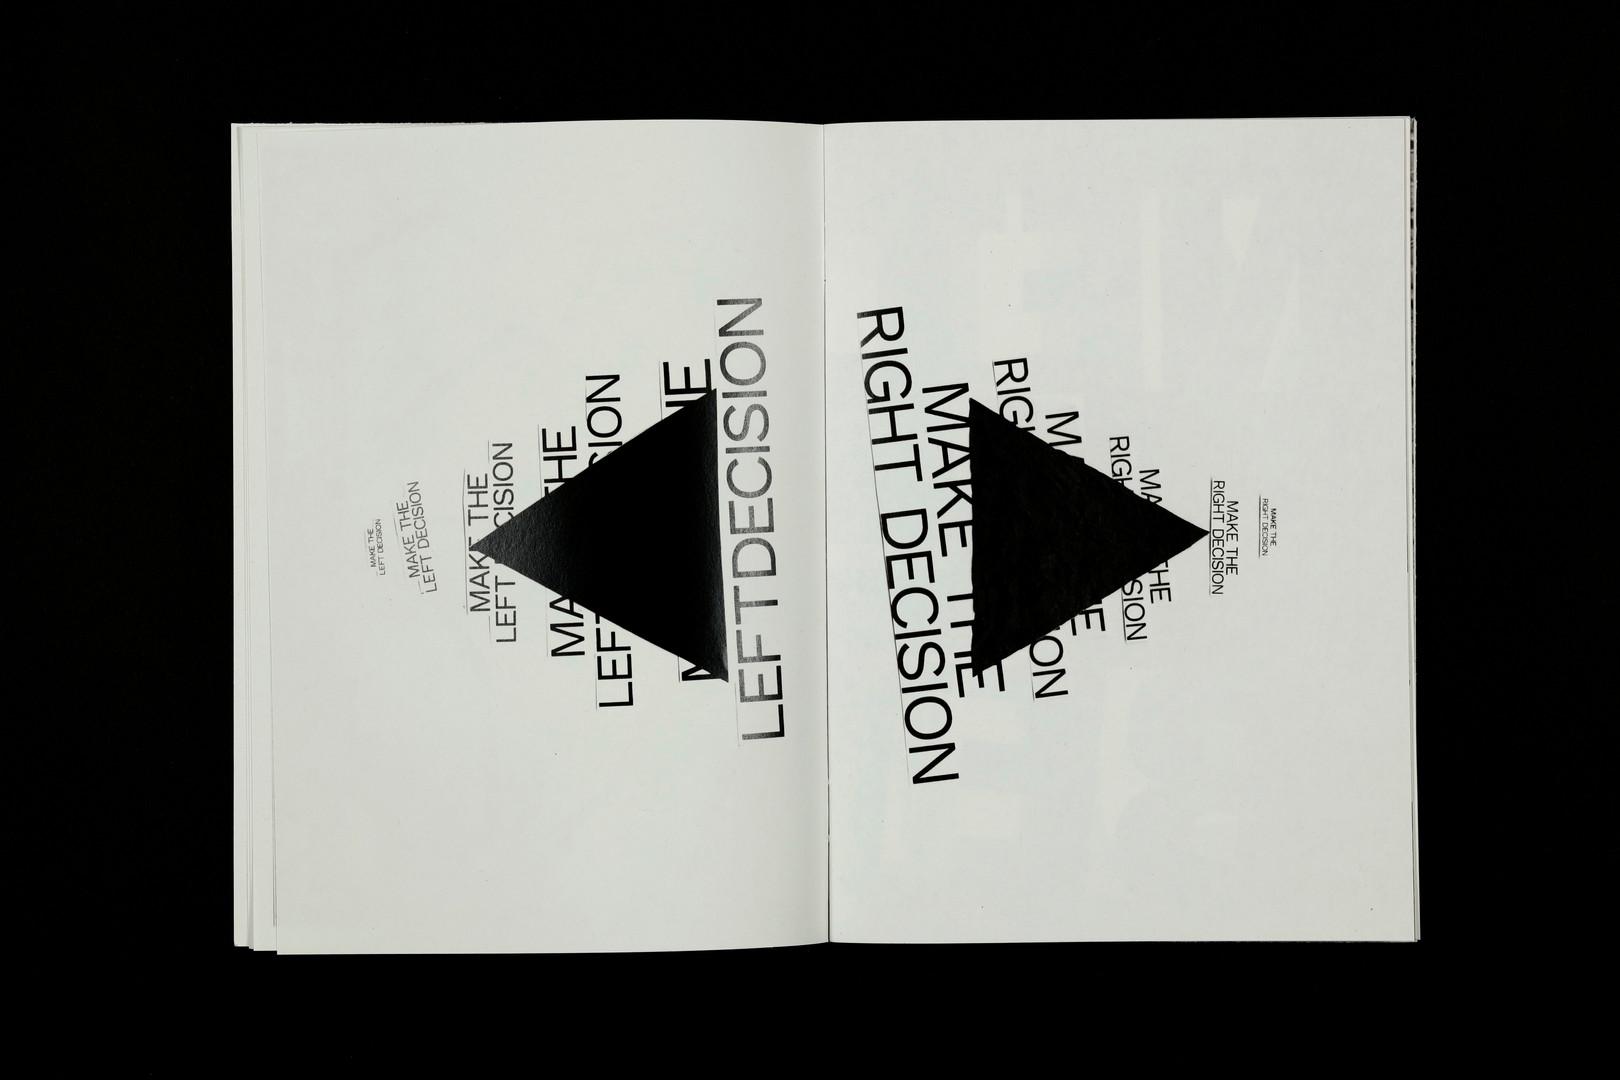 Procastination-Book-Mock-up_06.jpg